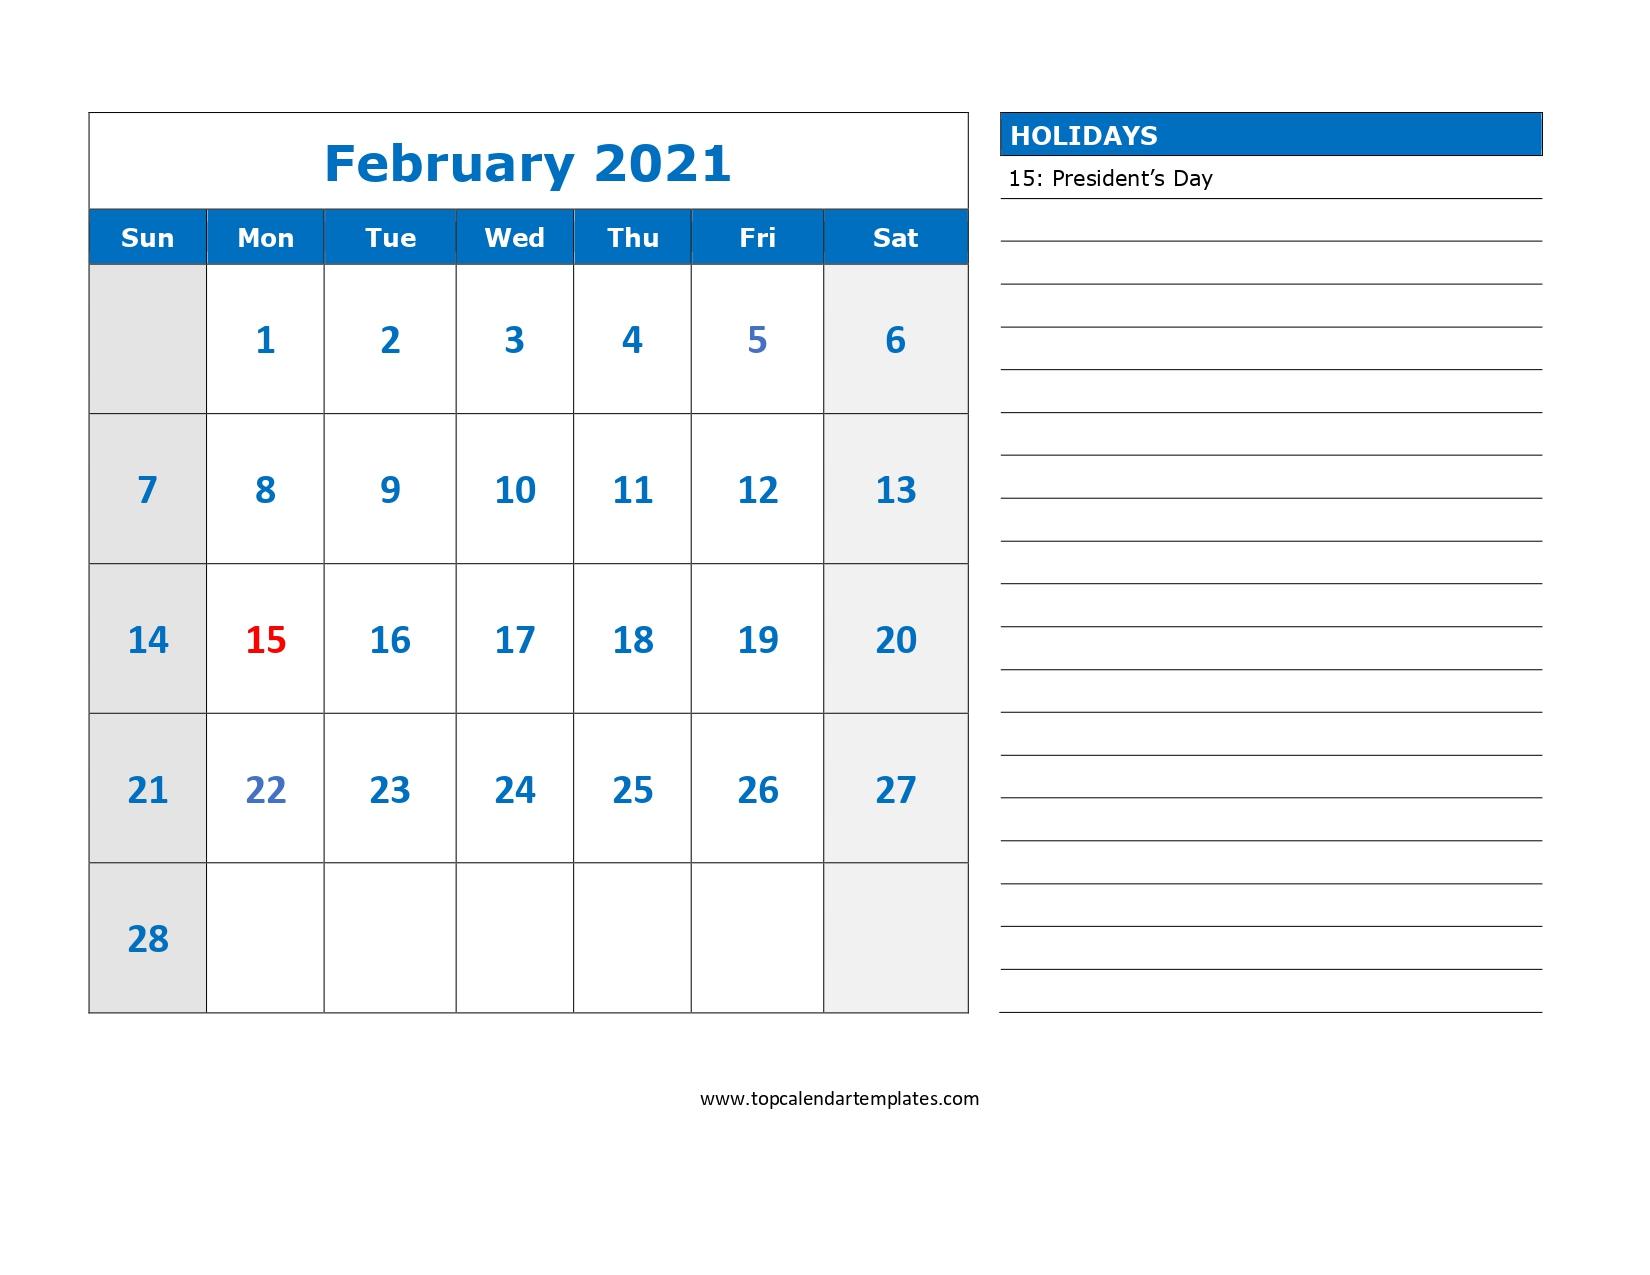 February 2021 Printable Calendar In Editable Format